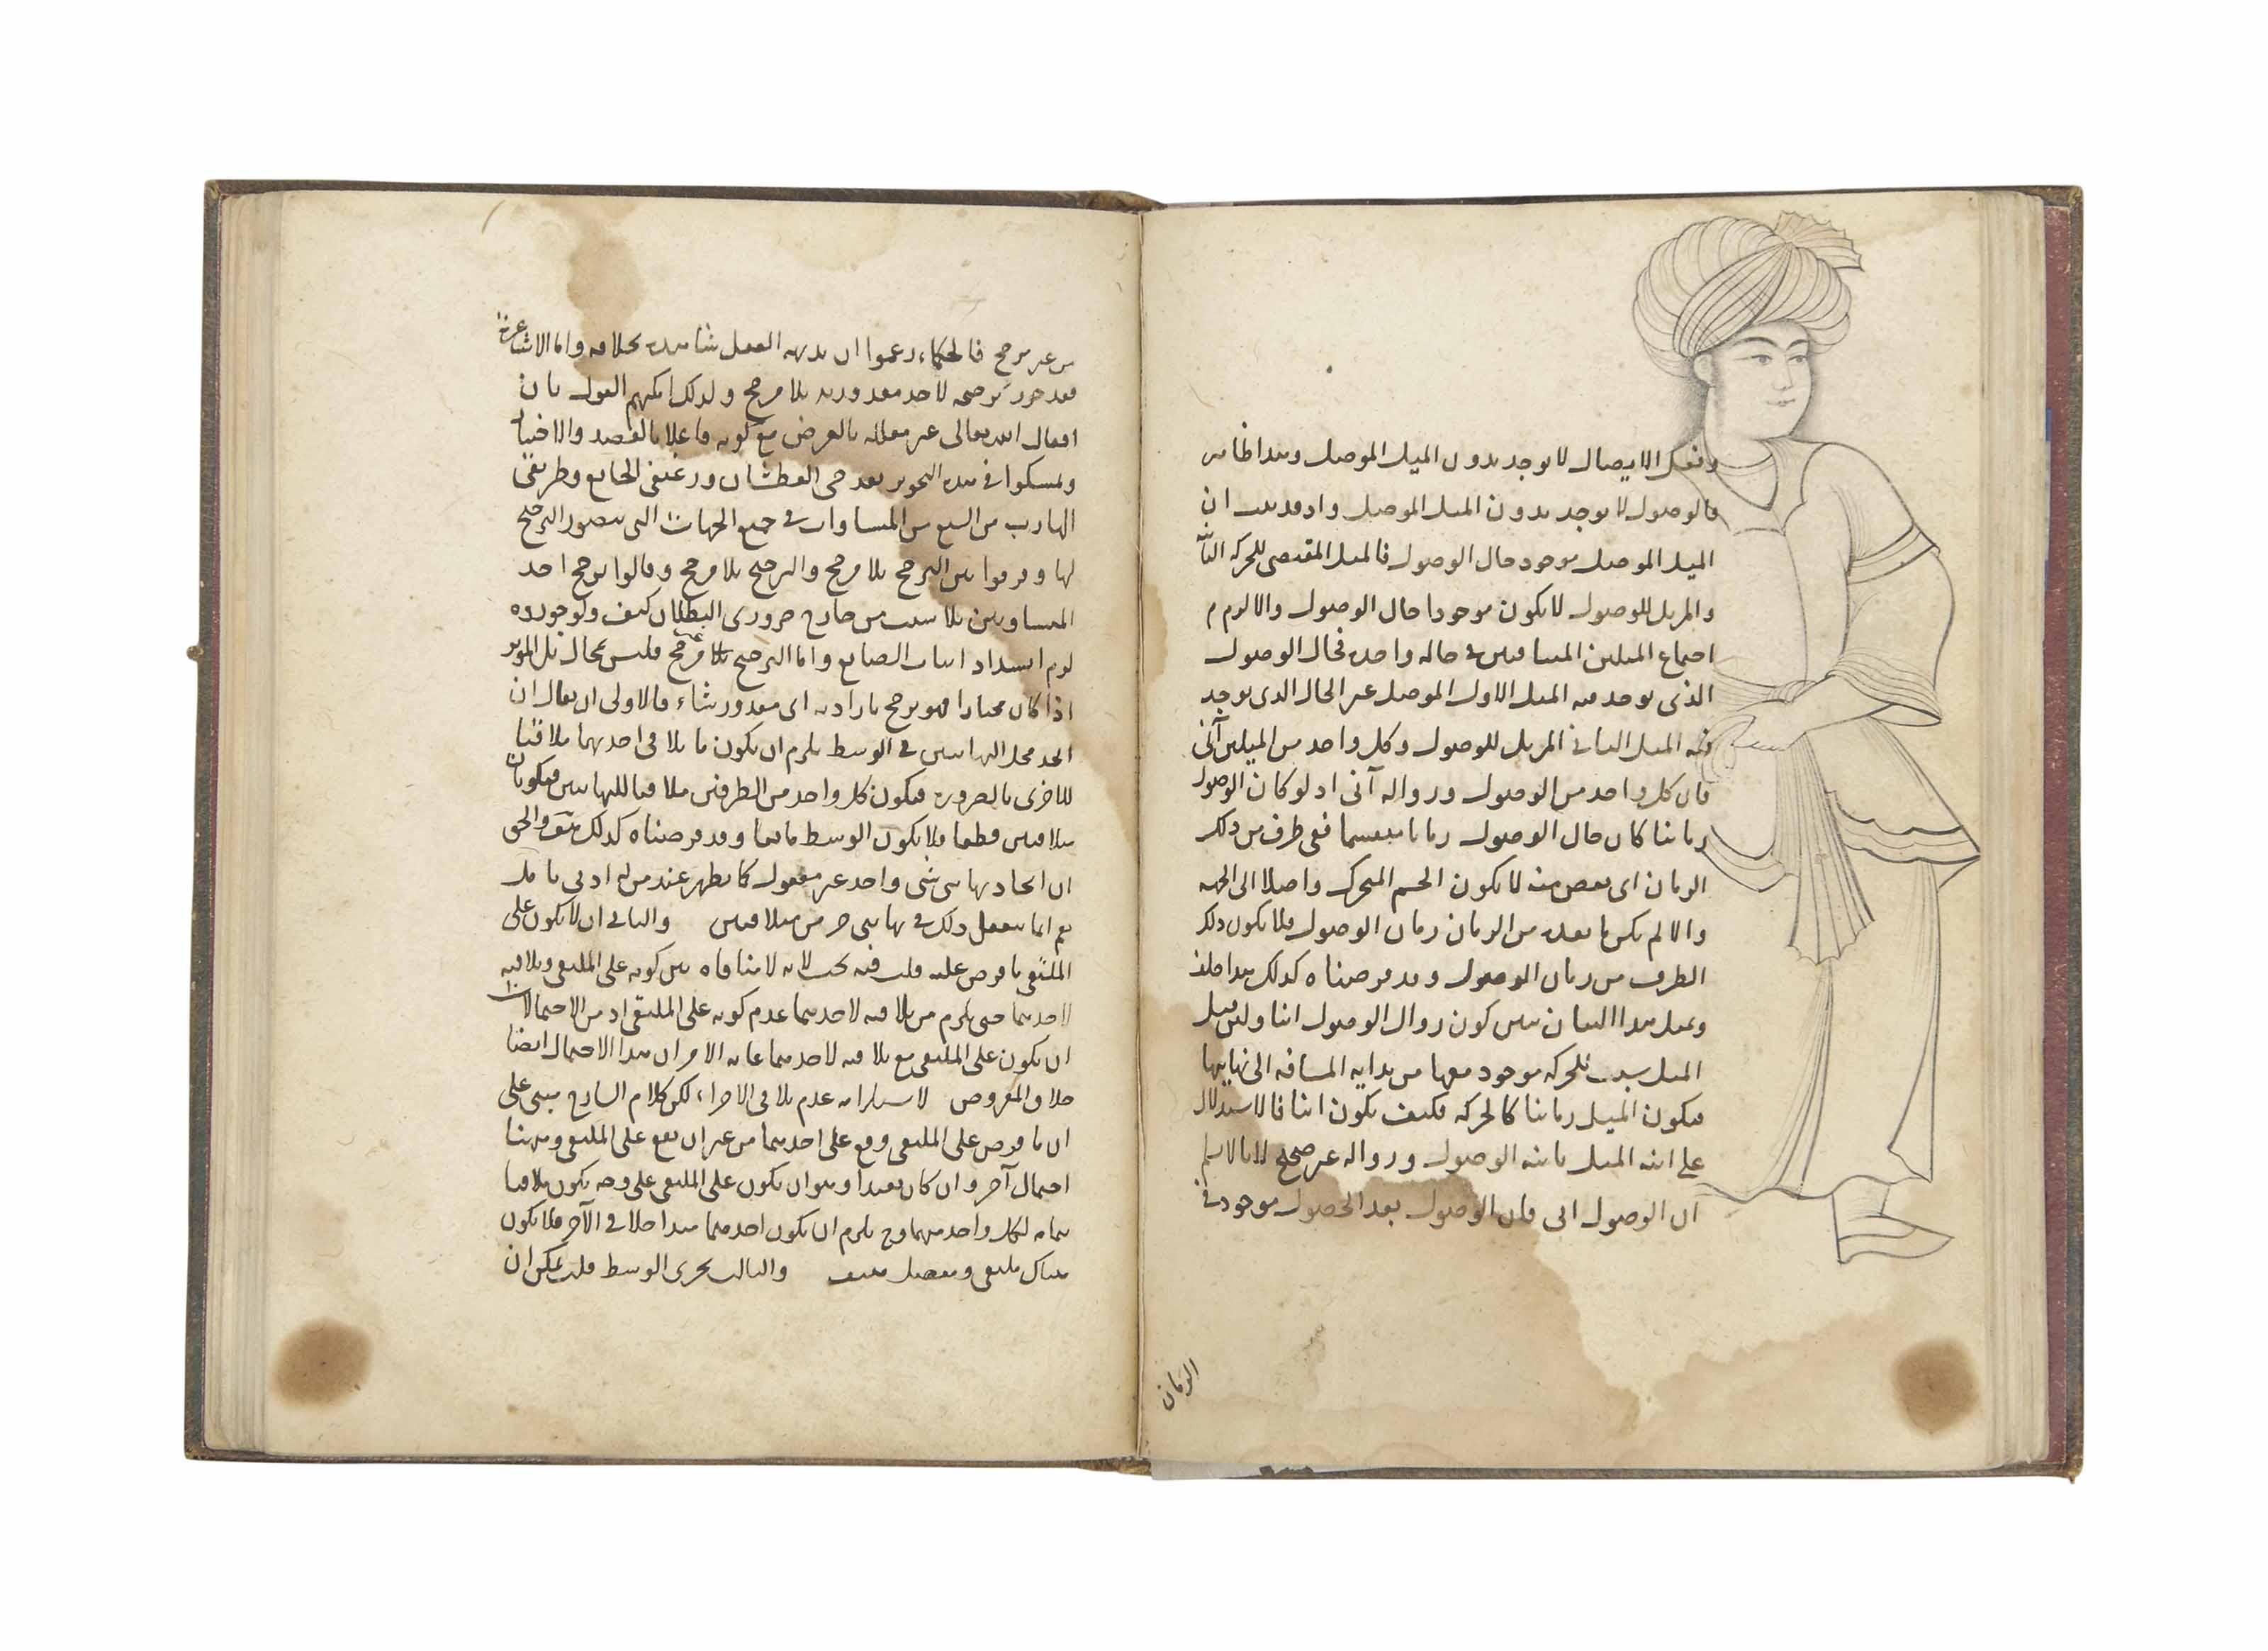 MAWLANA ZADEH AHMAD BIN MAHMUD AL-HARAWI (FL. 14TH CENTURY): SHARH HIDAYAT AL-HIKMA